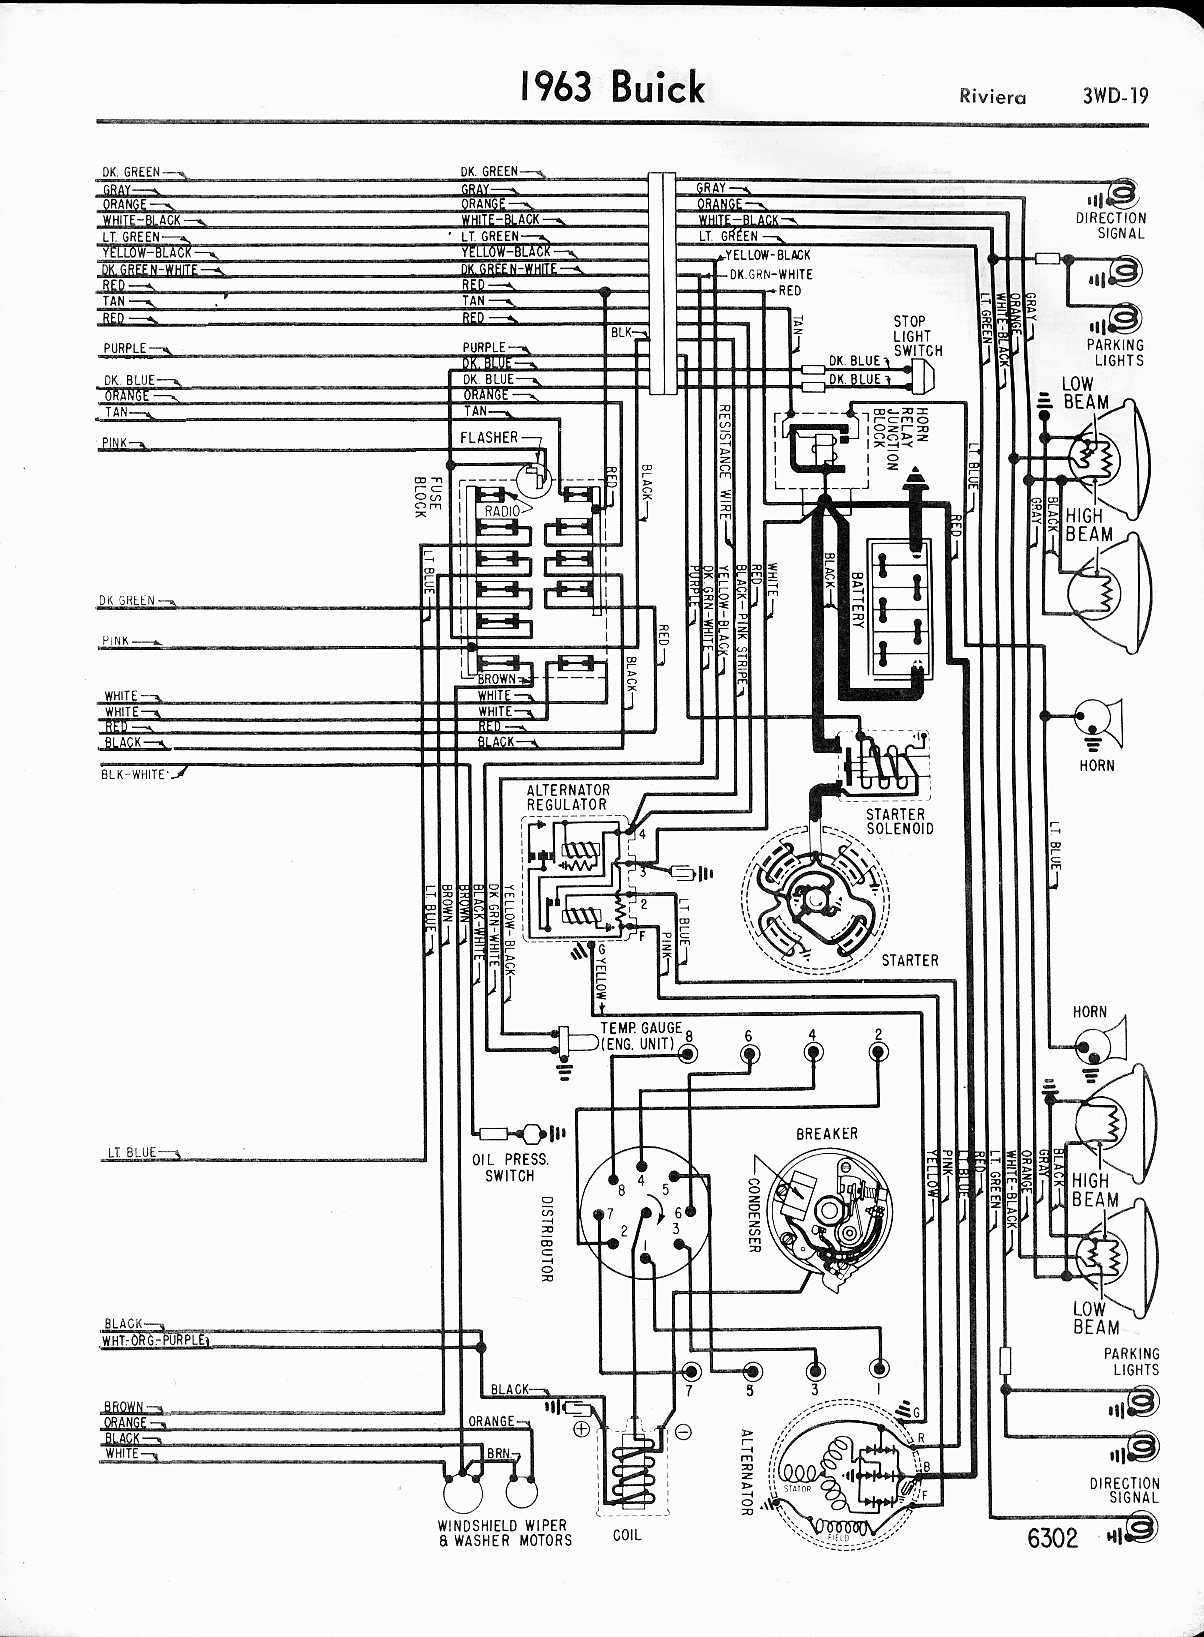 75 buick wiring diagram